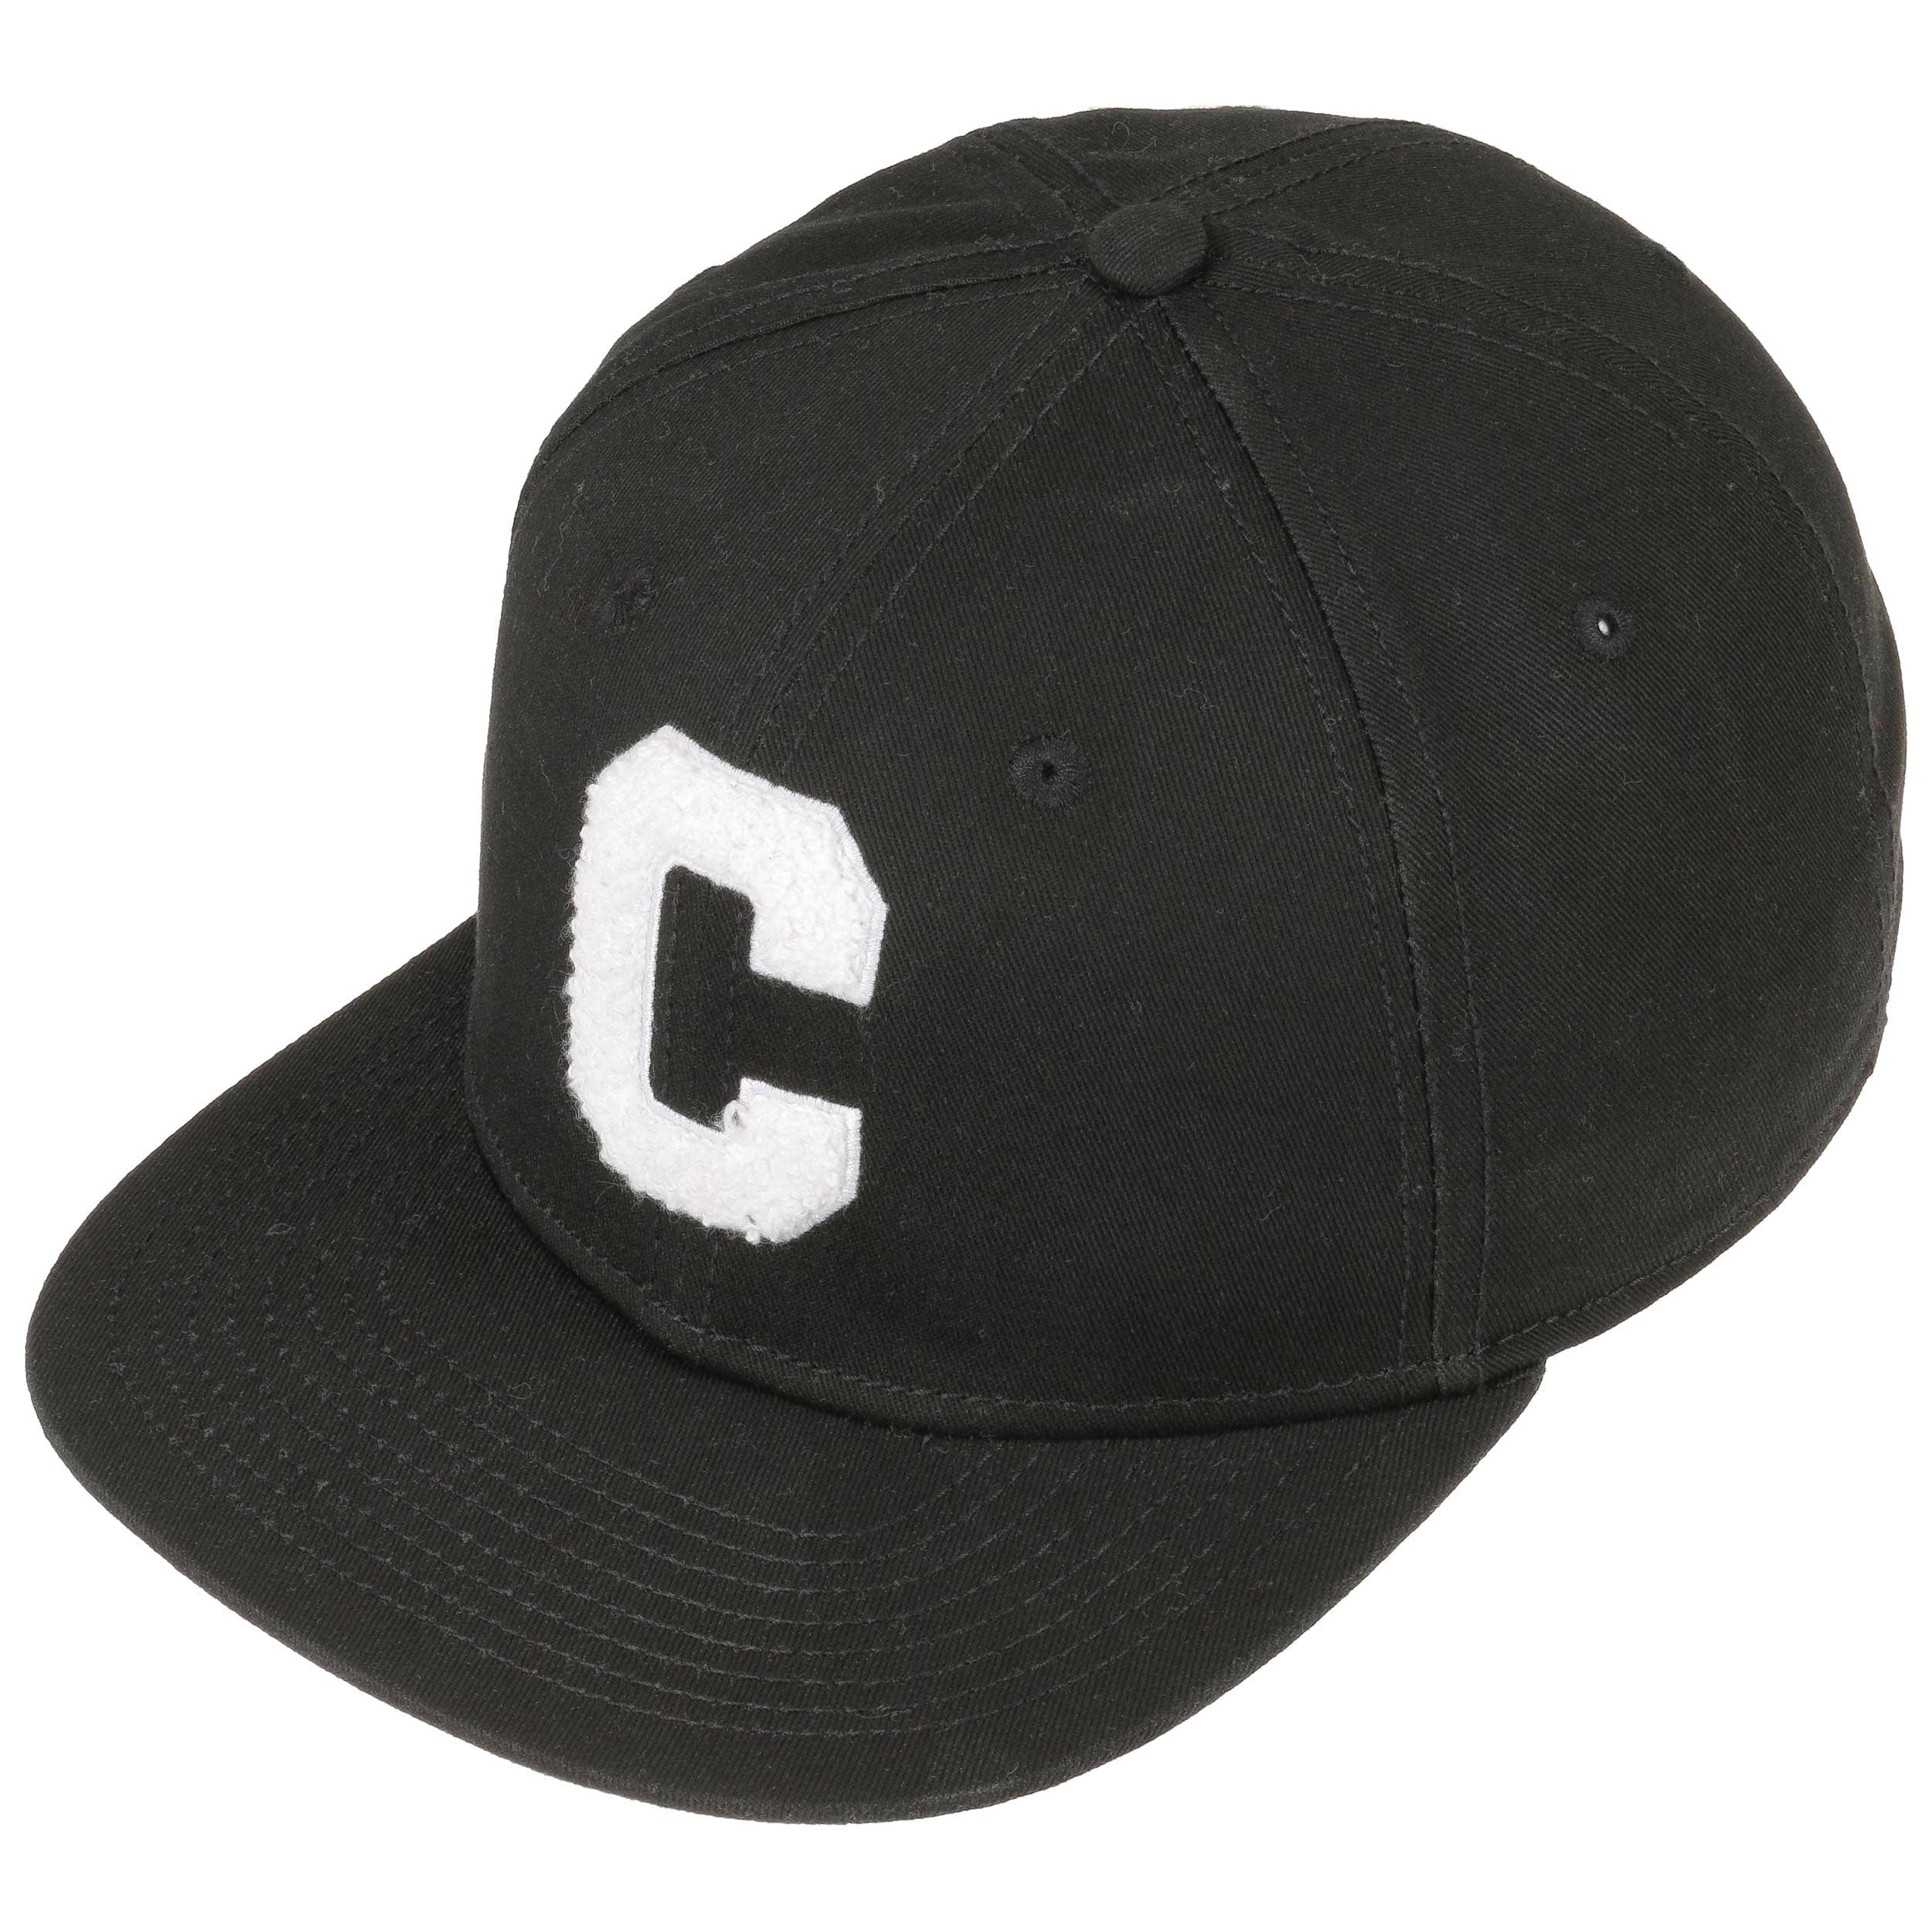 Gorra Chenille C Snapback by Converse - Gorras - sombreroshop.es 2f83e50fc58